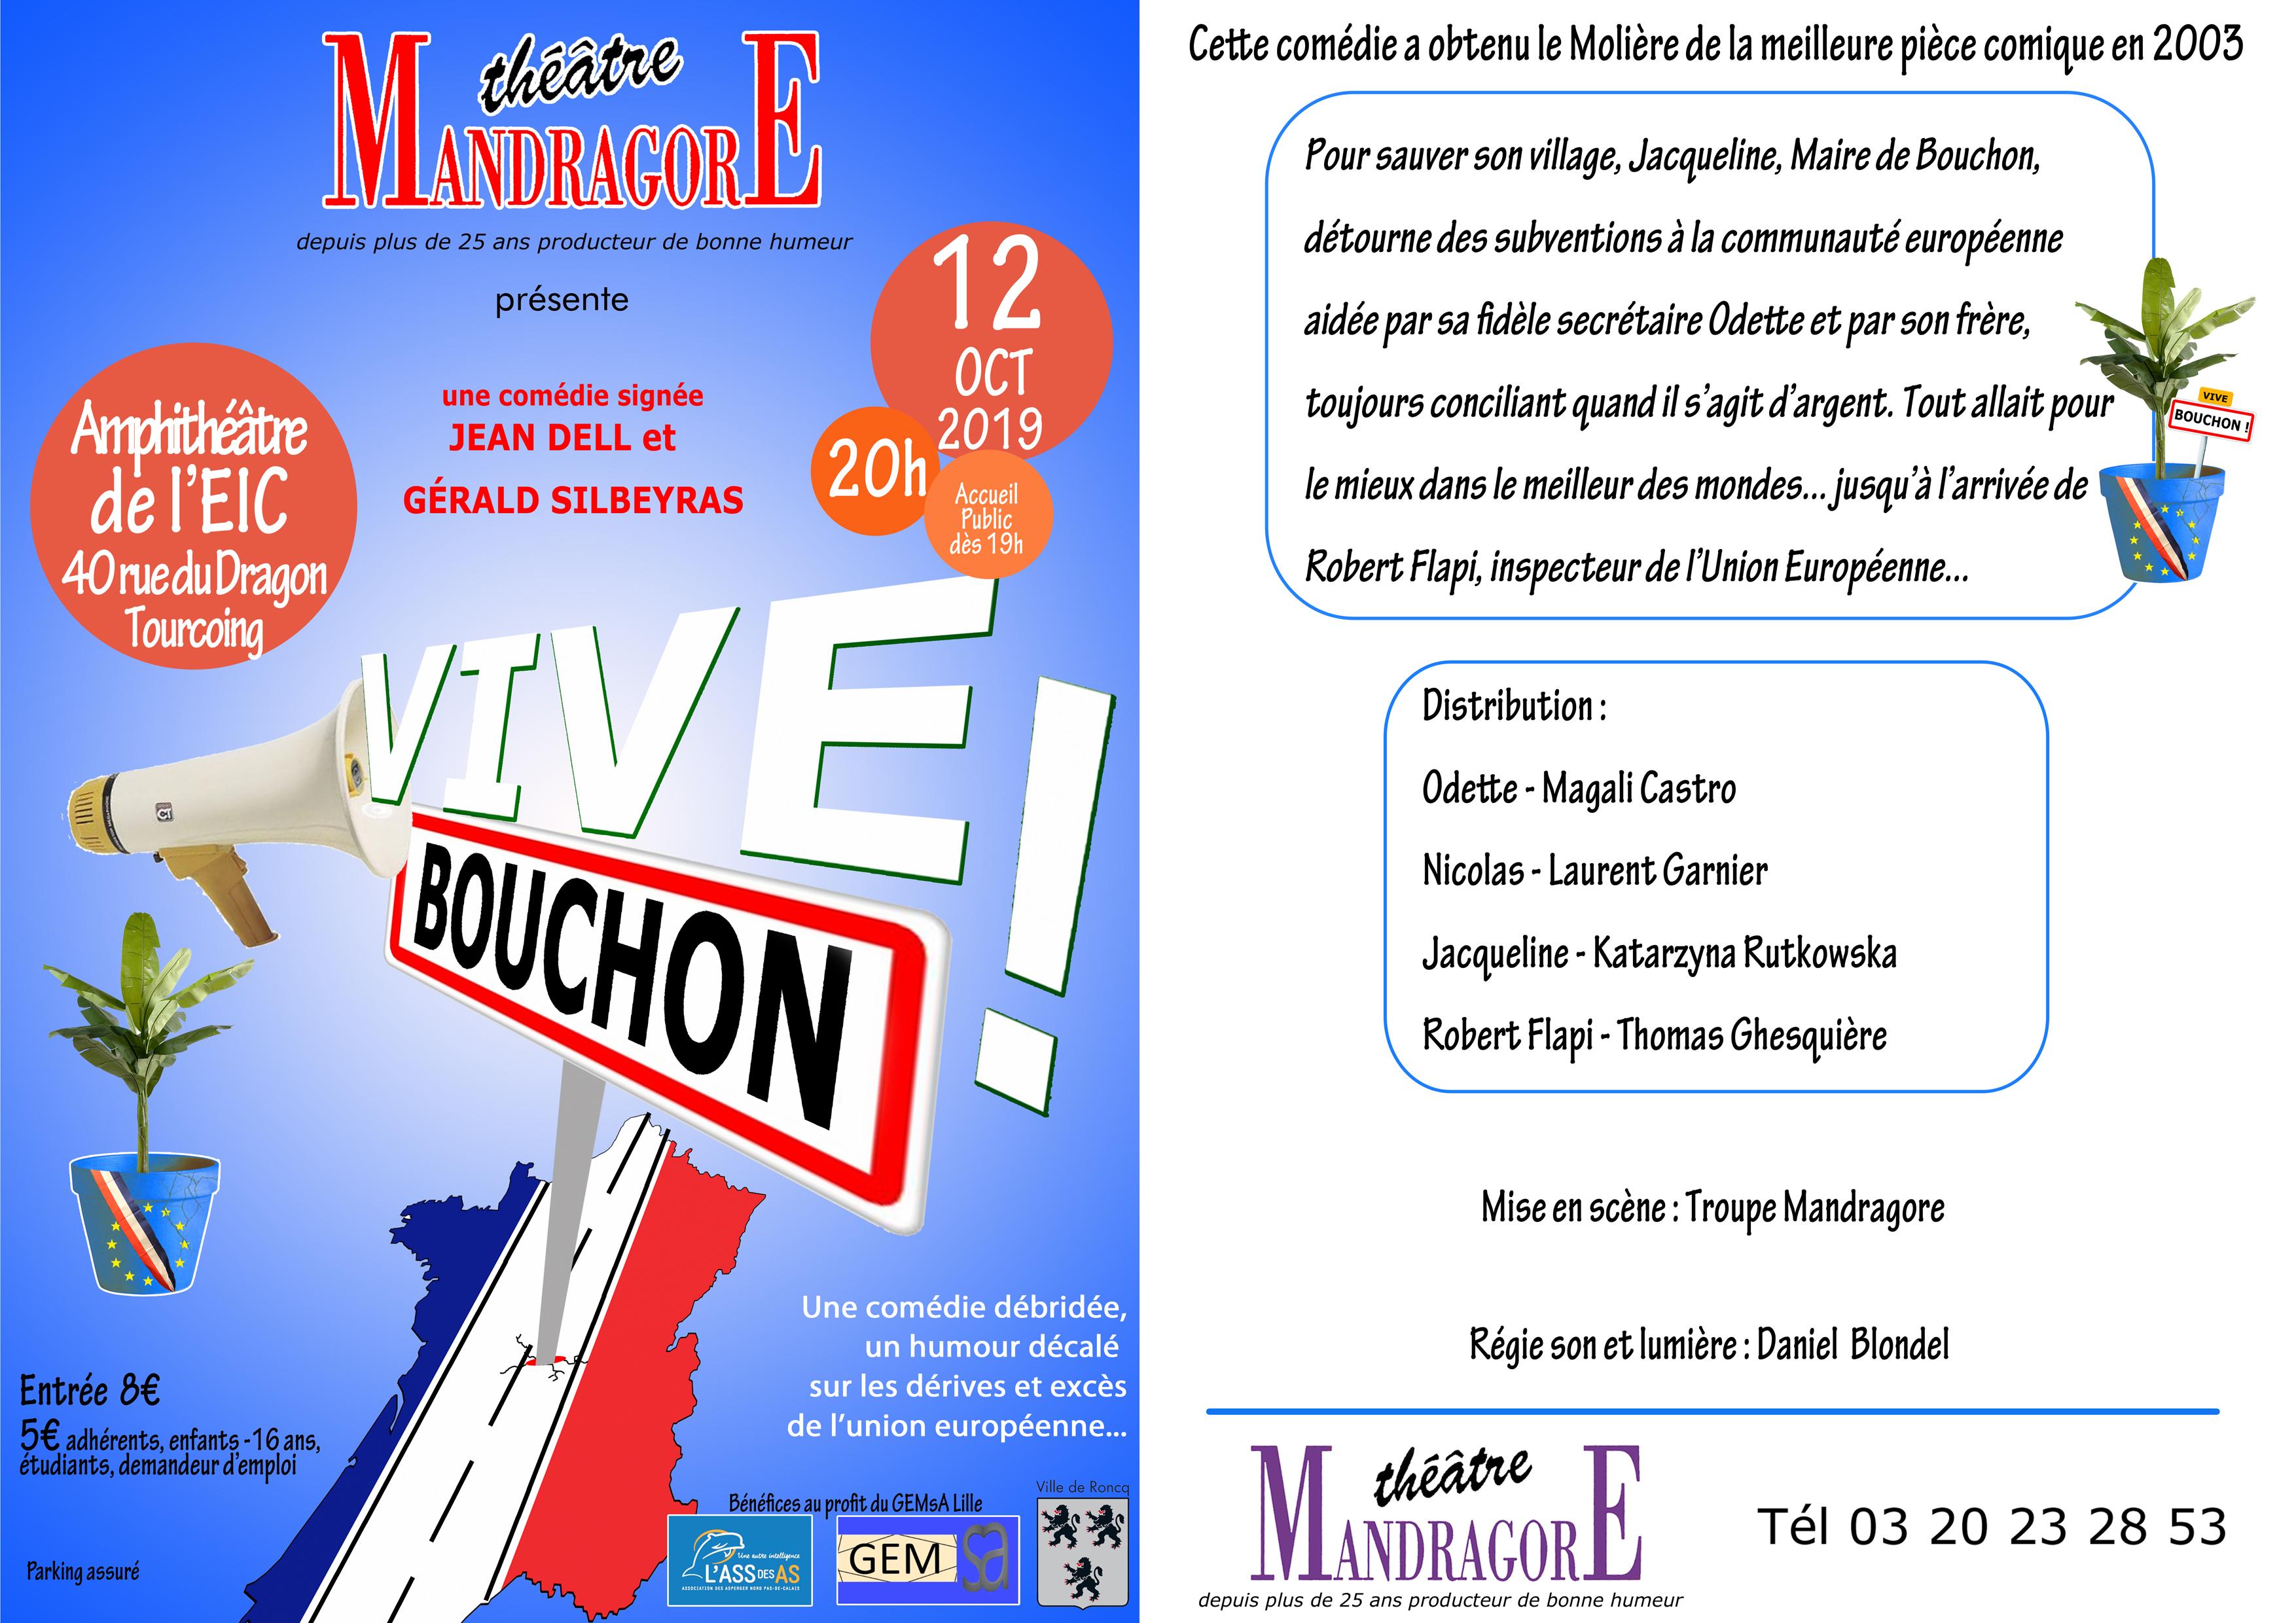 Vive Bouchon EIC